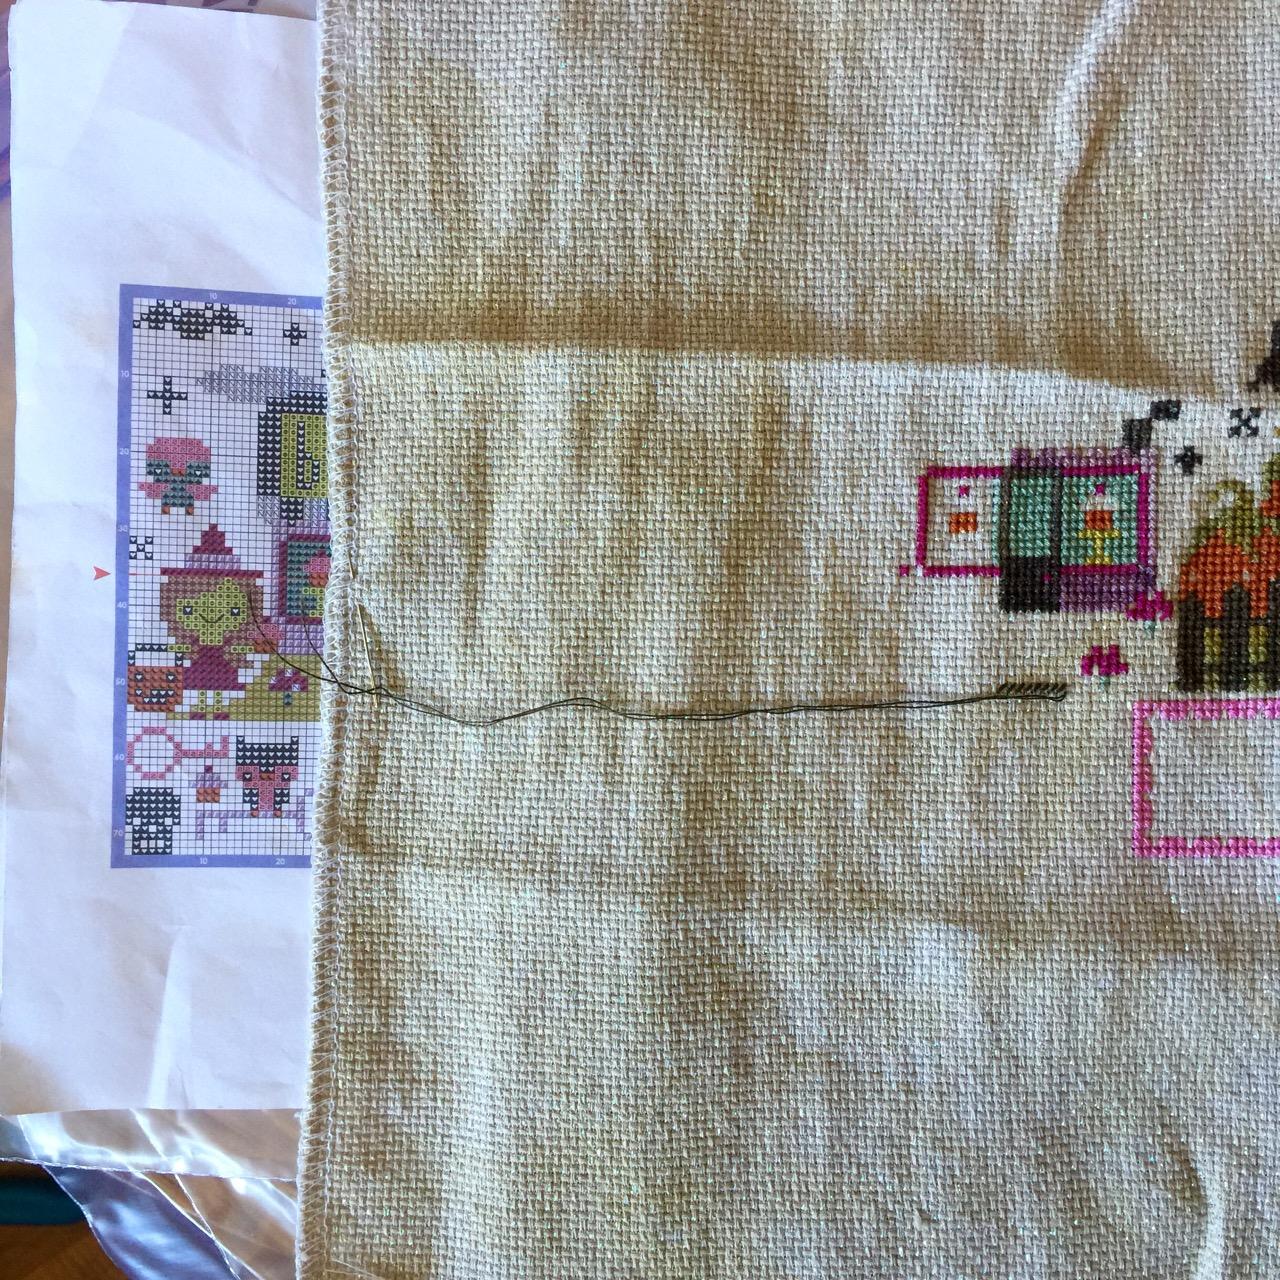 How I make cross stitch work in my fringe minutes